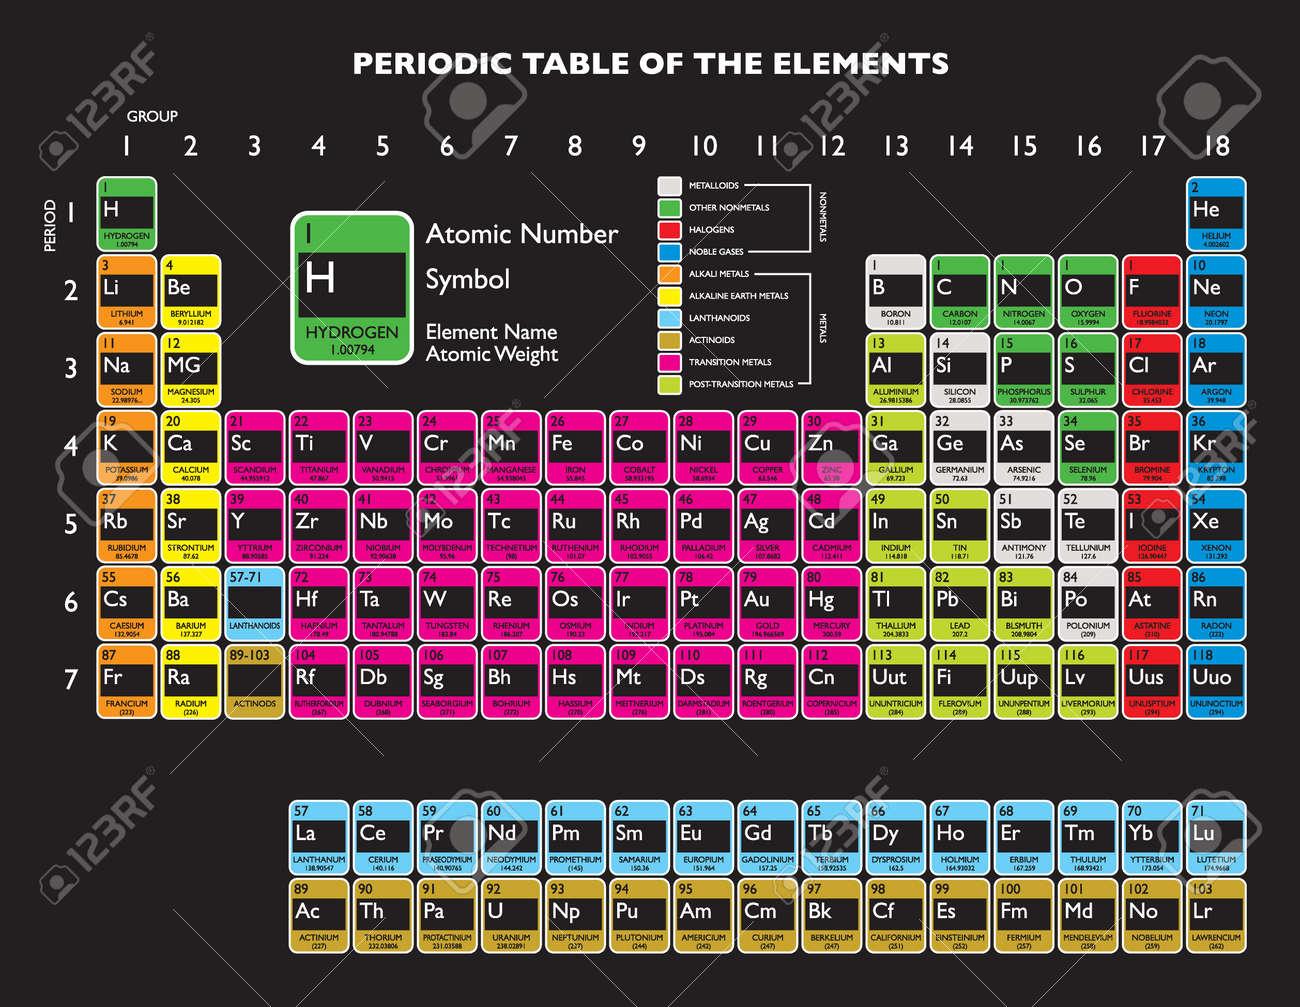 Updated periodic table with livermorium and flerovium for education - 12392390